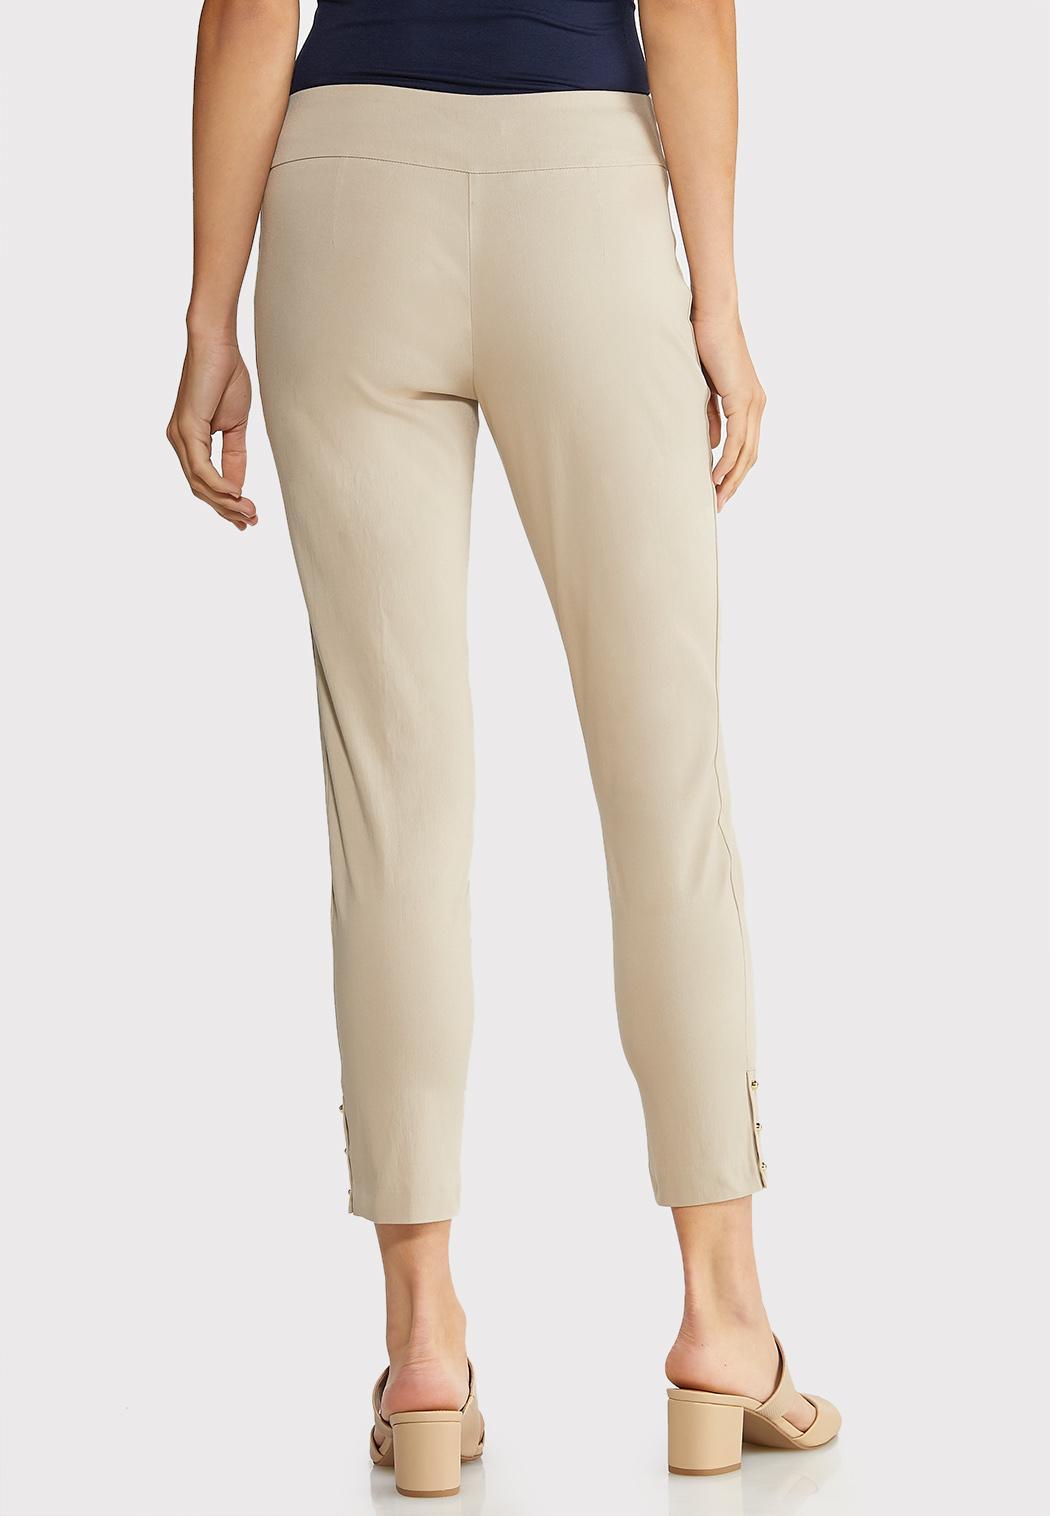 Studded Ankle Pants (Item #43910590)